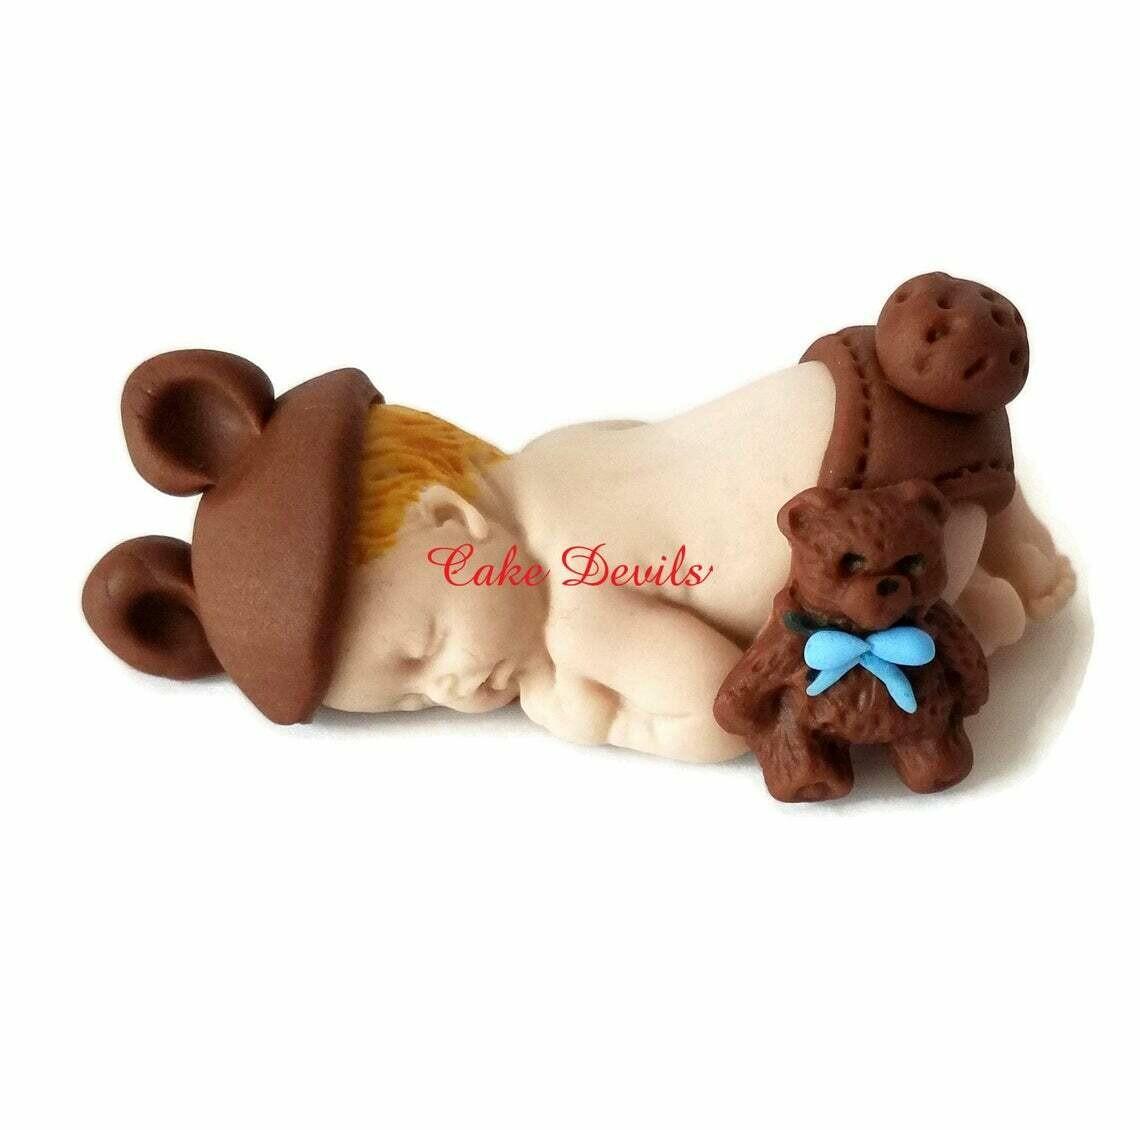 Fondant Baby Cake Topper dressed as Teddy Bear for Baby Shower, Baptism, or Christening